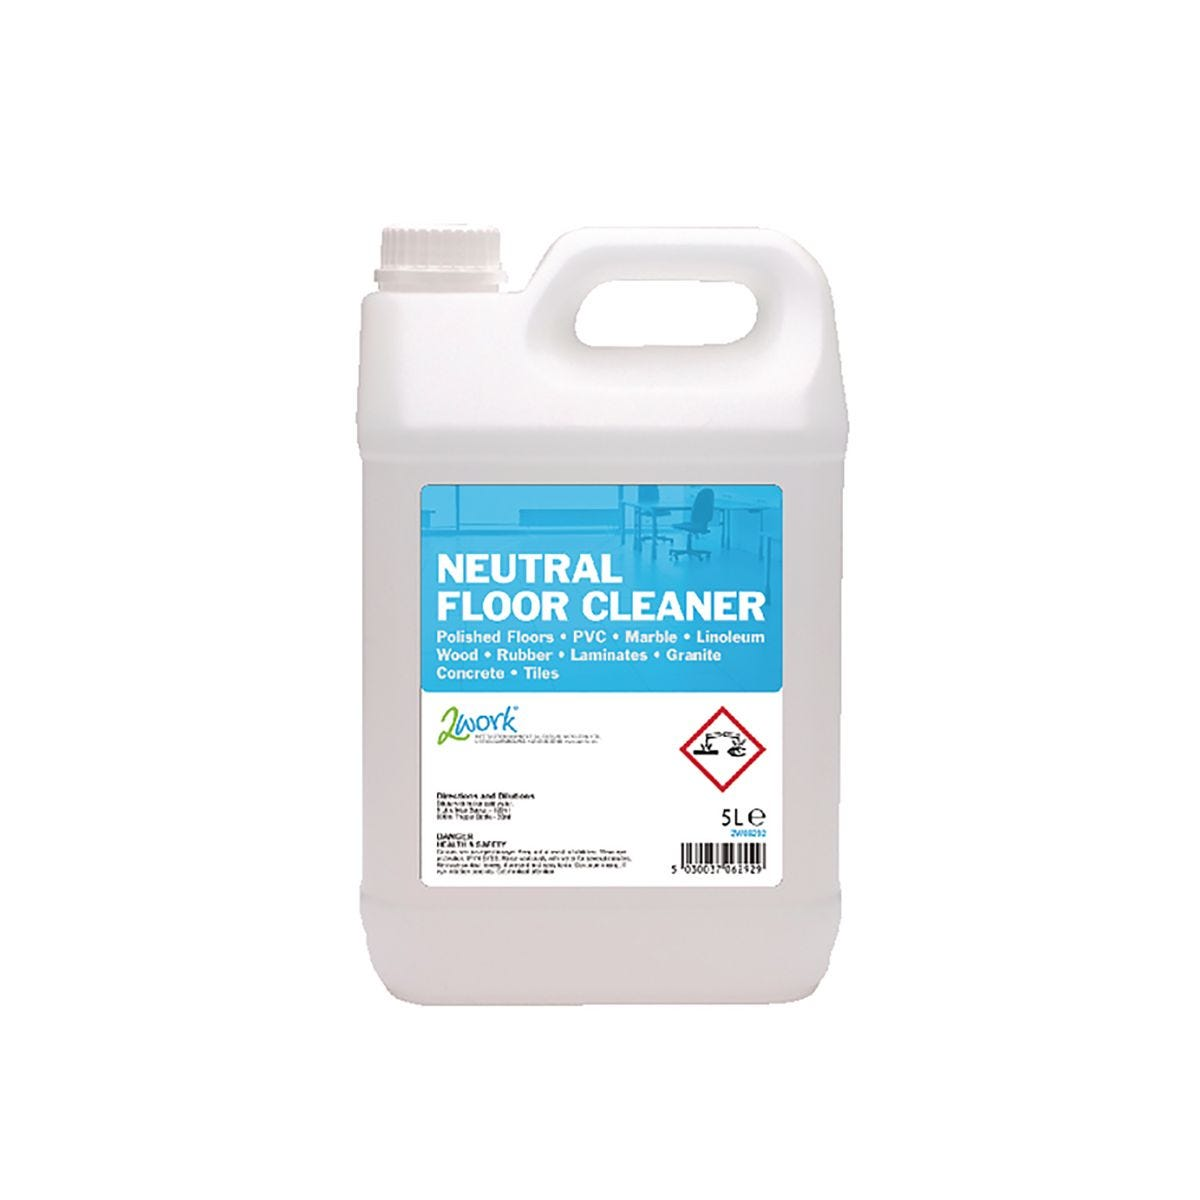 Image of 2Work Neutral Floor Cleaner 5 Litre